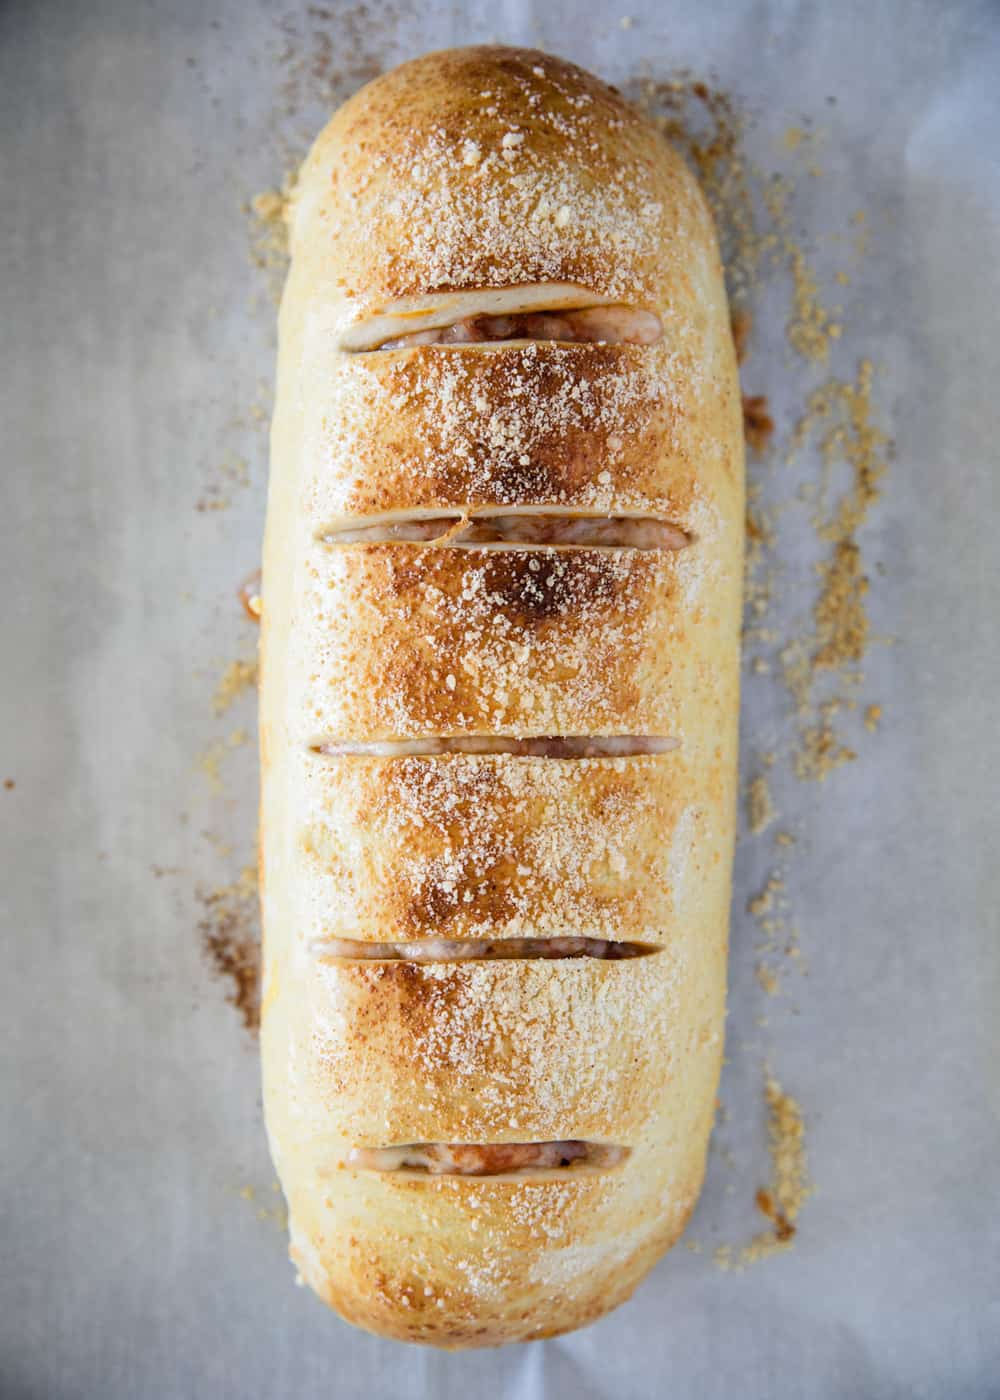 Stromboli on a baking sheet